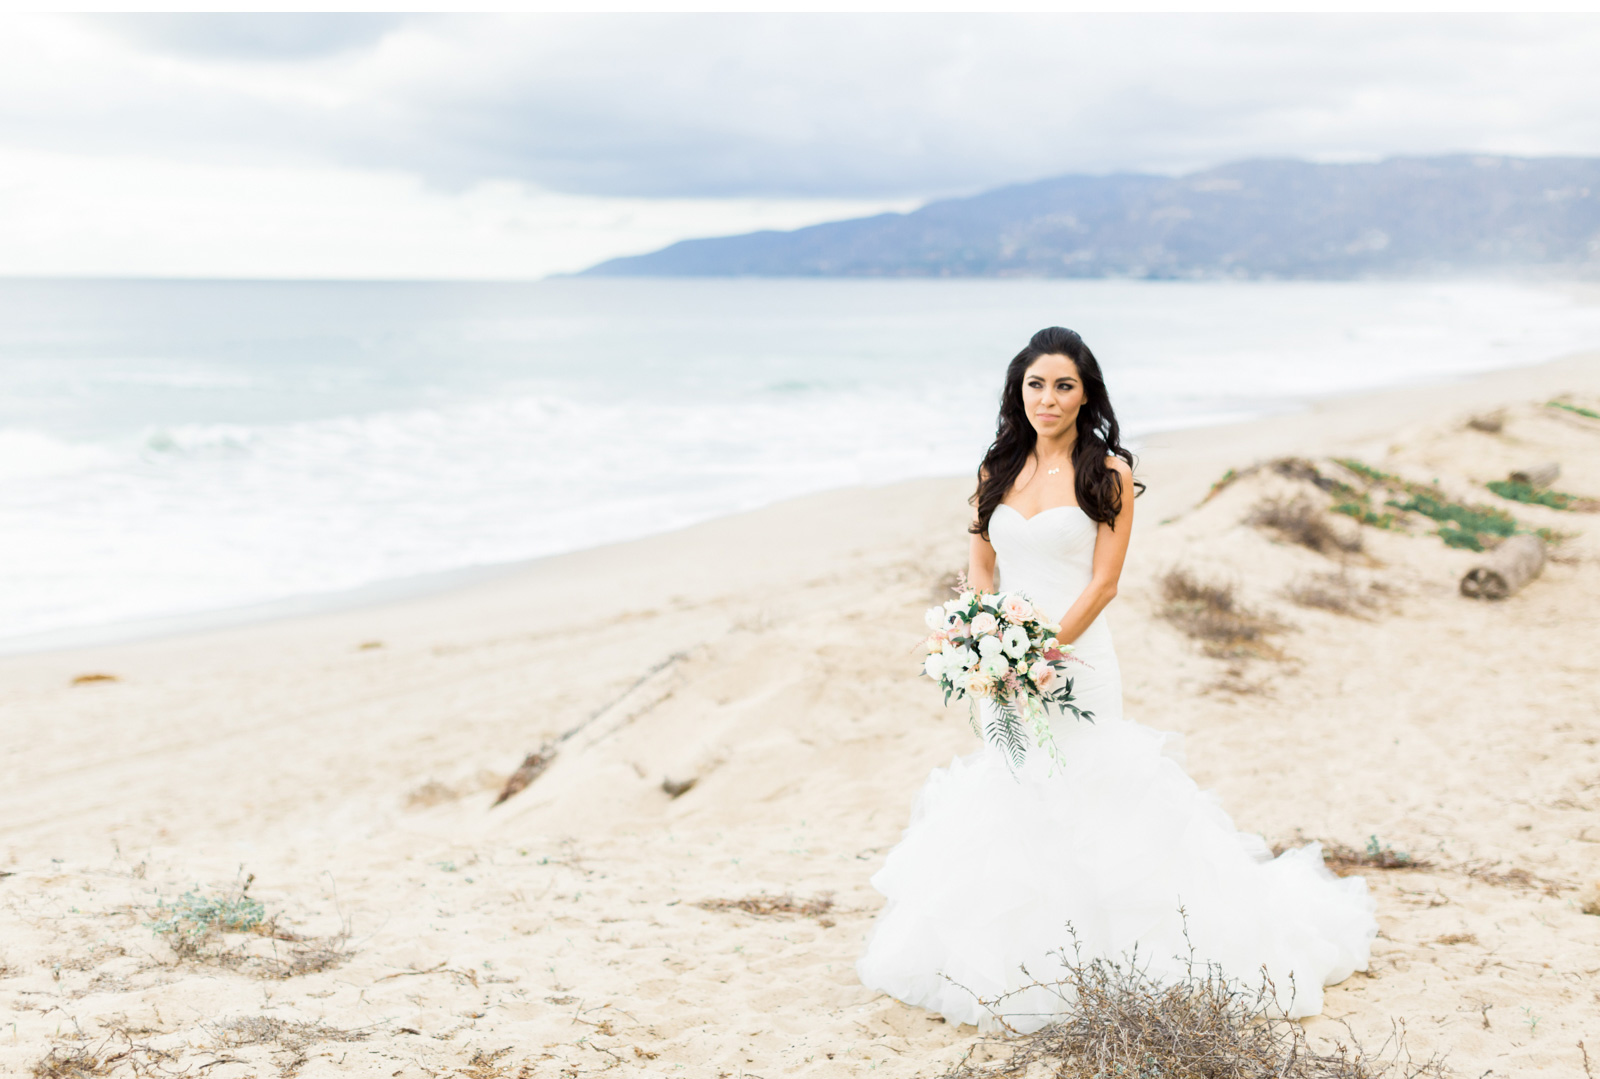 Malibu-First-Look-Natalie-Schutt-Photography-Rod-Brewster_07.jpg